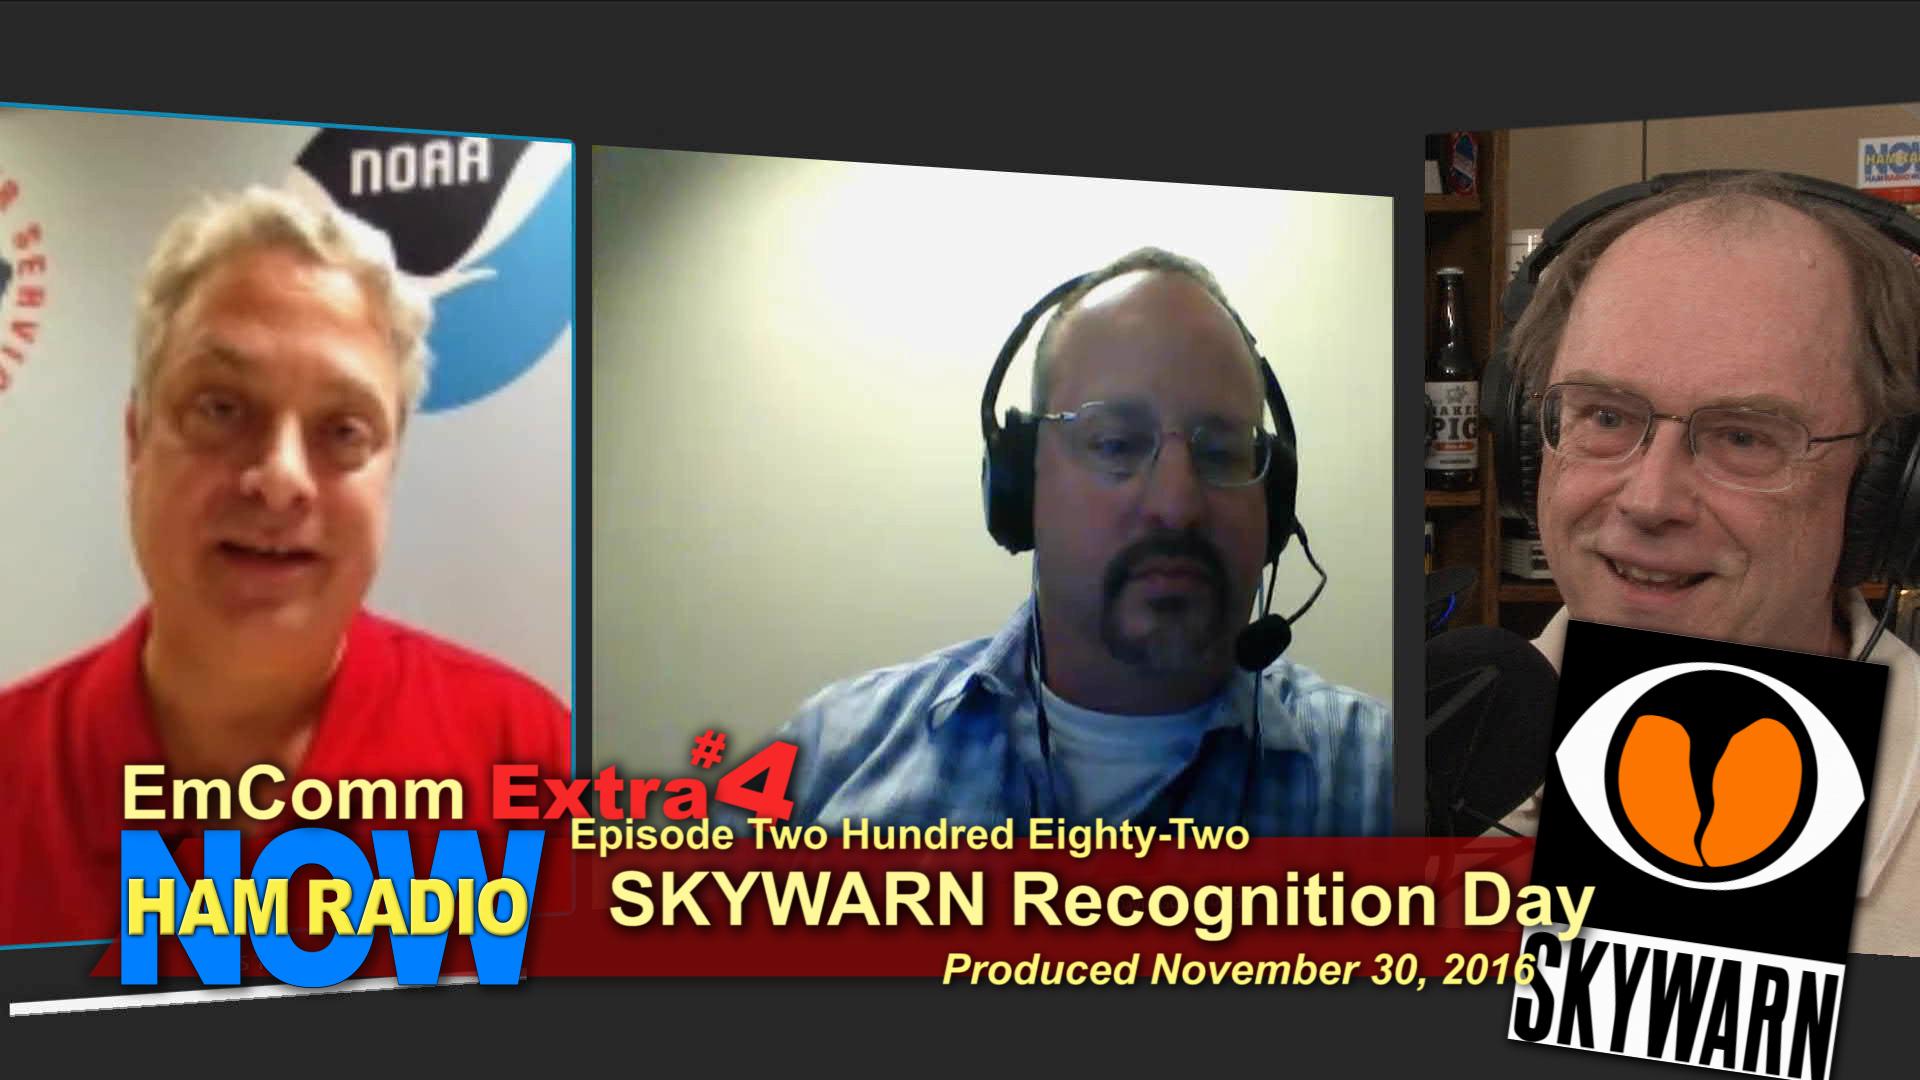 HRN 282 EMCOMM 4 Skywarn Recon Day 2016.00_01_29_20.Still001.jpg